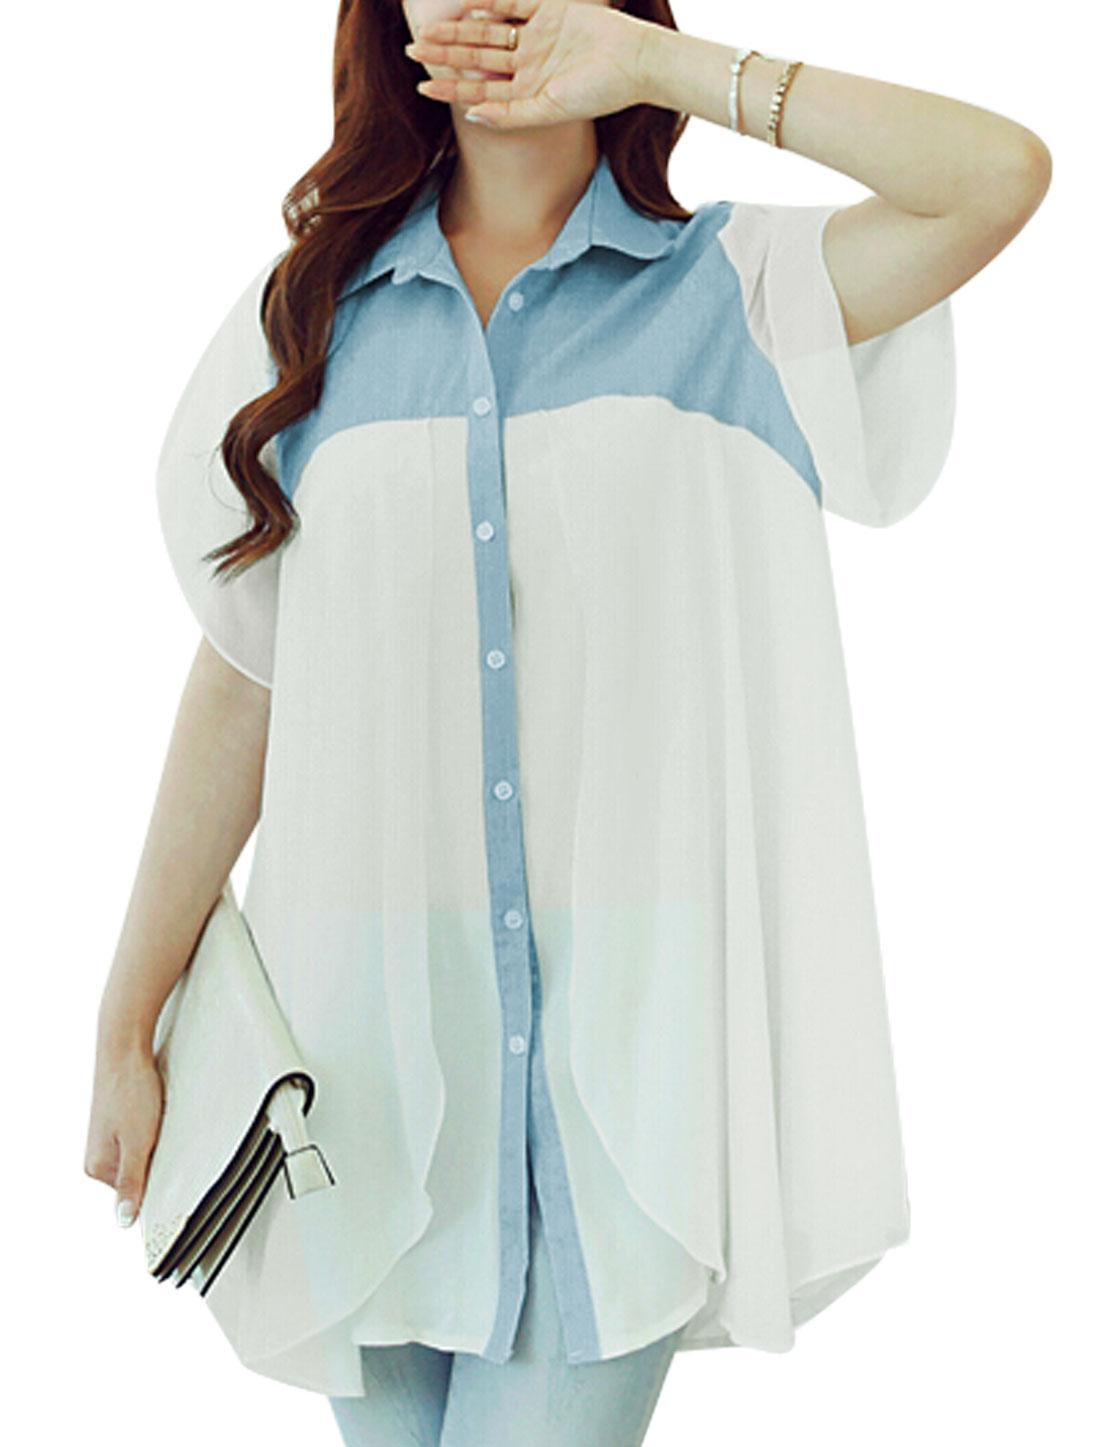 Women Point Collar Short Petal Sleeves Chiffon Tunic Shirts Light Blue White S